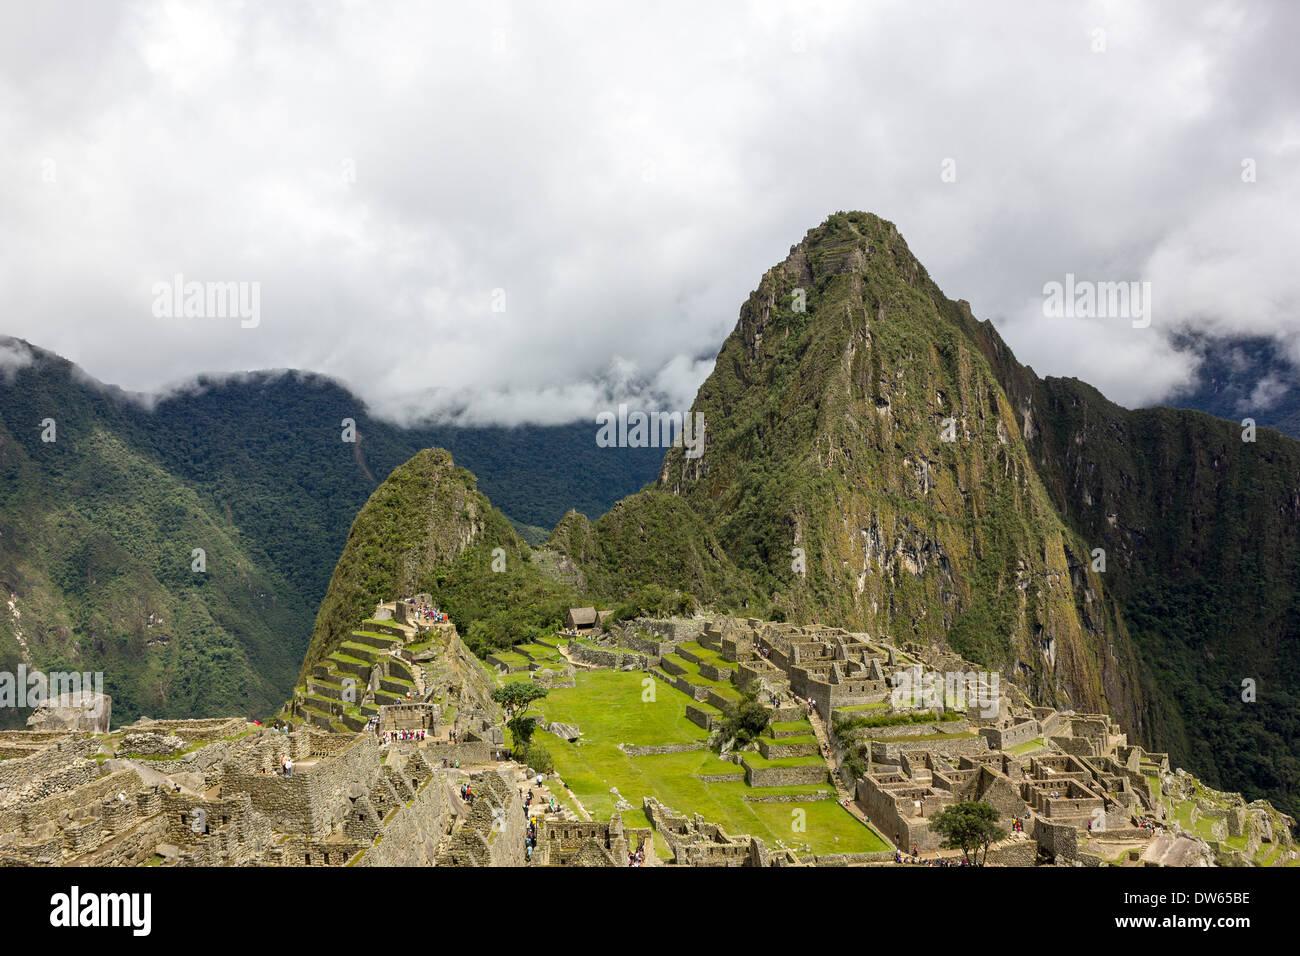 Incan ruins of Machu Picchu with Huayna Picchu, Peru - Stock Image